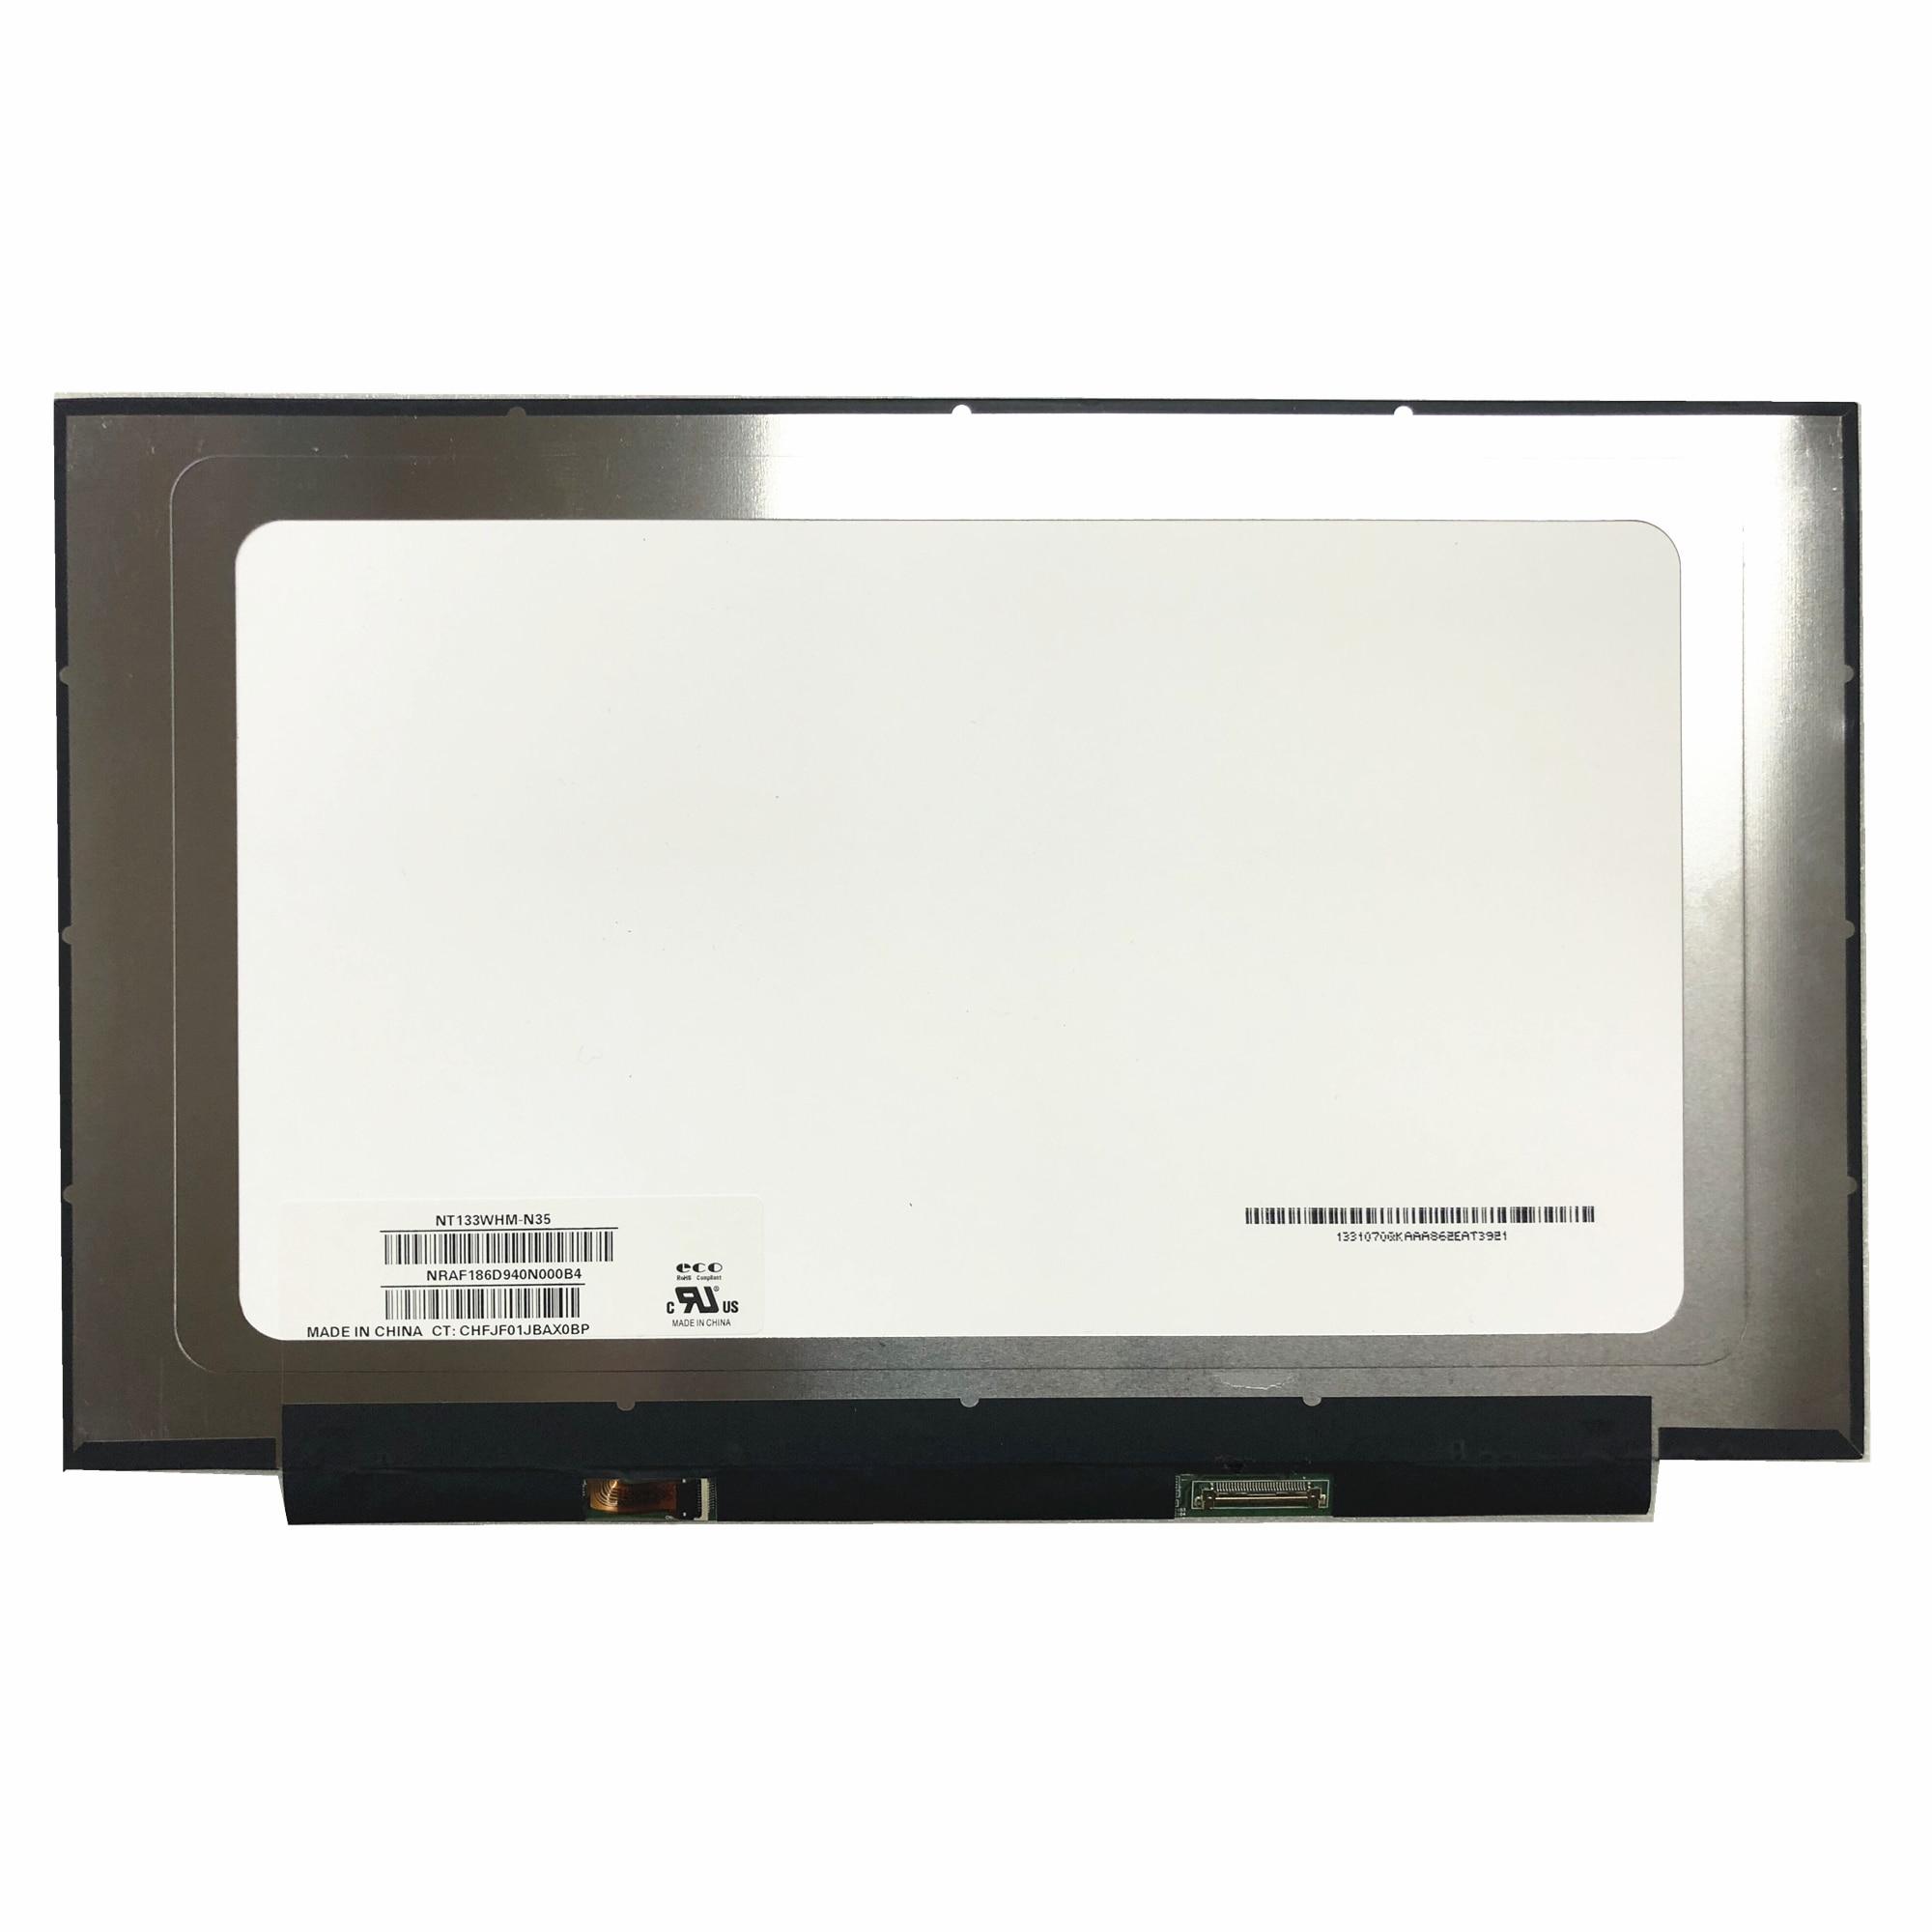 NT133WHM-N45 NT133WHM-N35 NT133WHM-N61 NT133WHM-N46 NT133WHM-N47 NT133WHM-N38 LCD شاشة